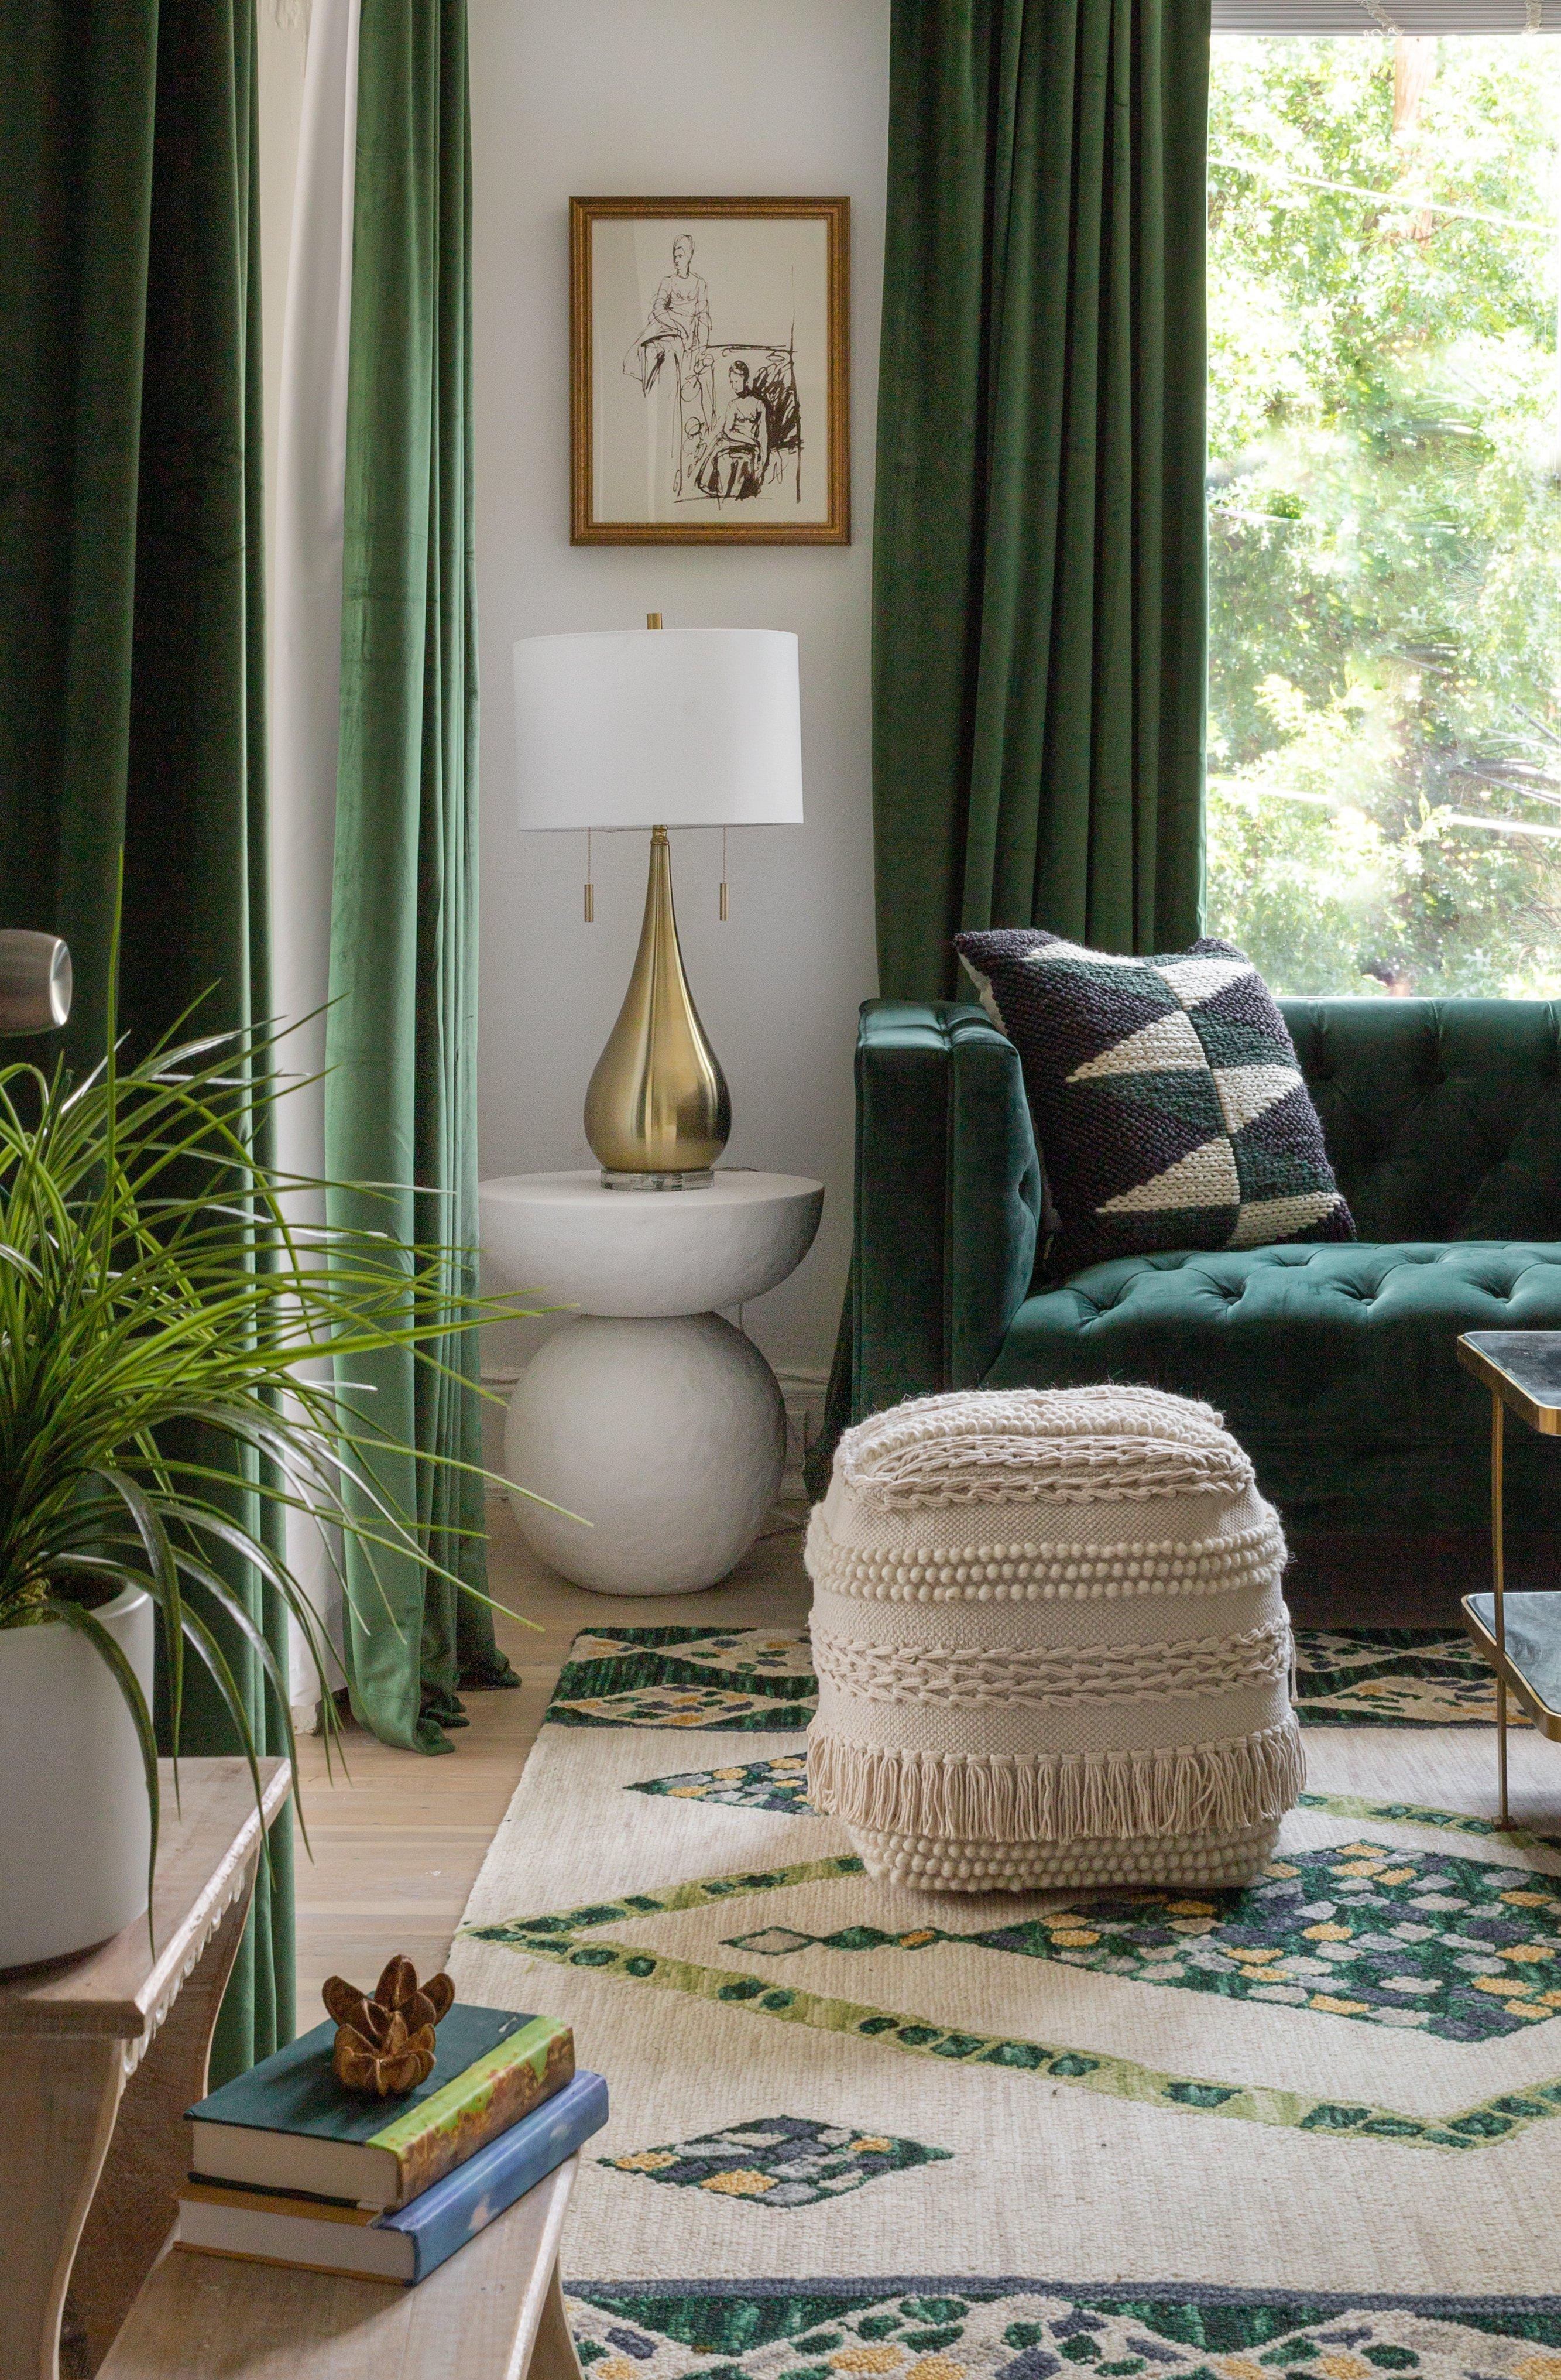 04 livingroom untitledswim-meet-2-36.jpg